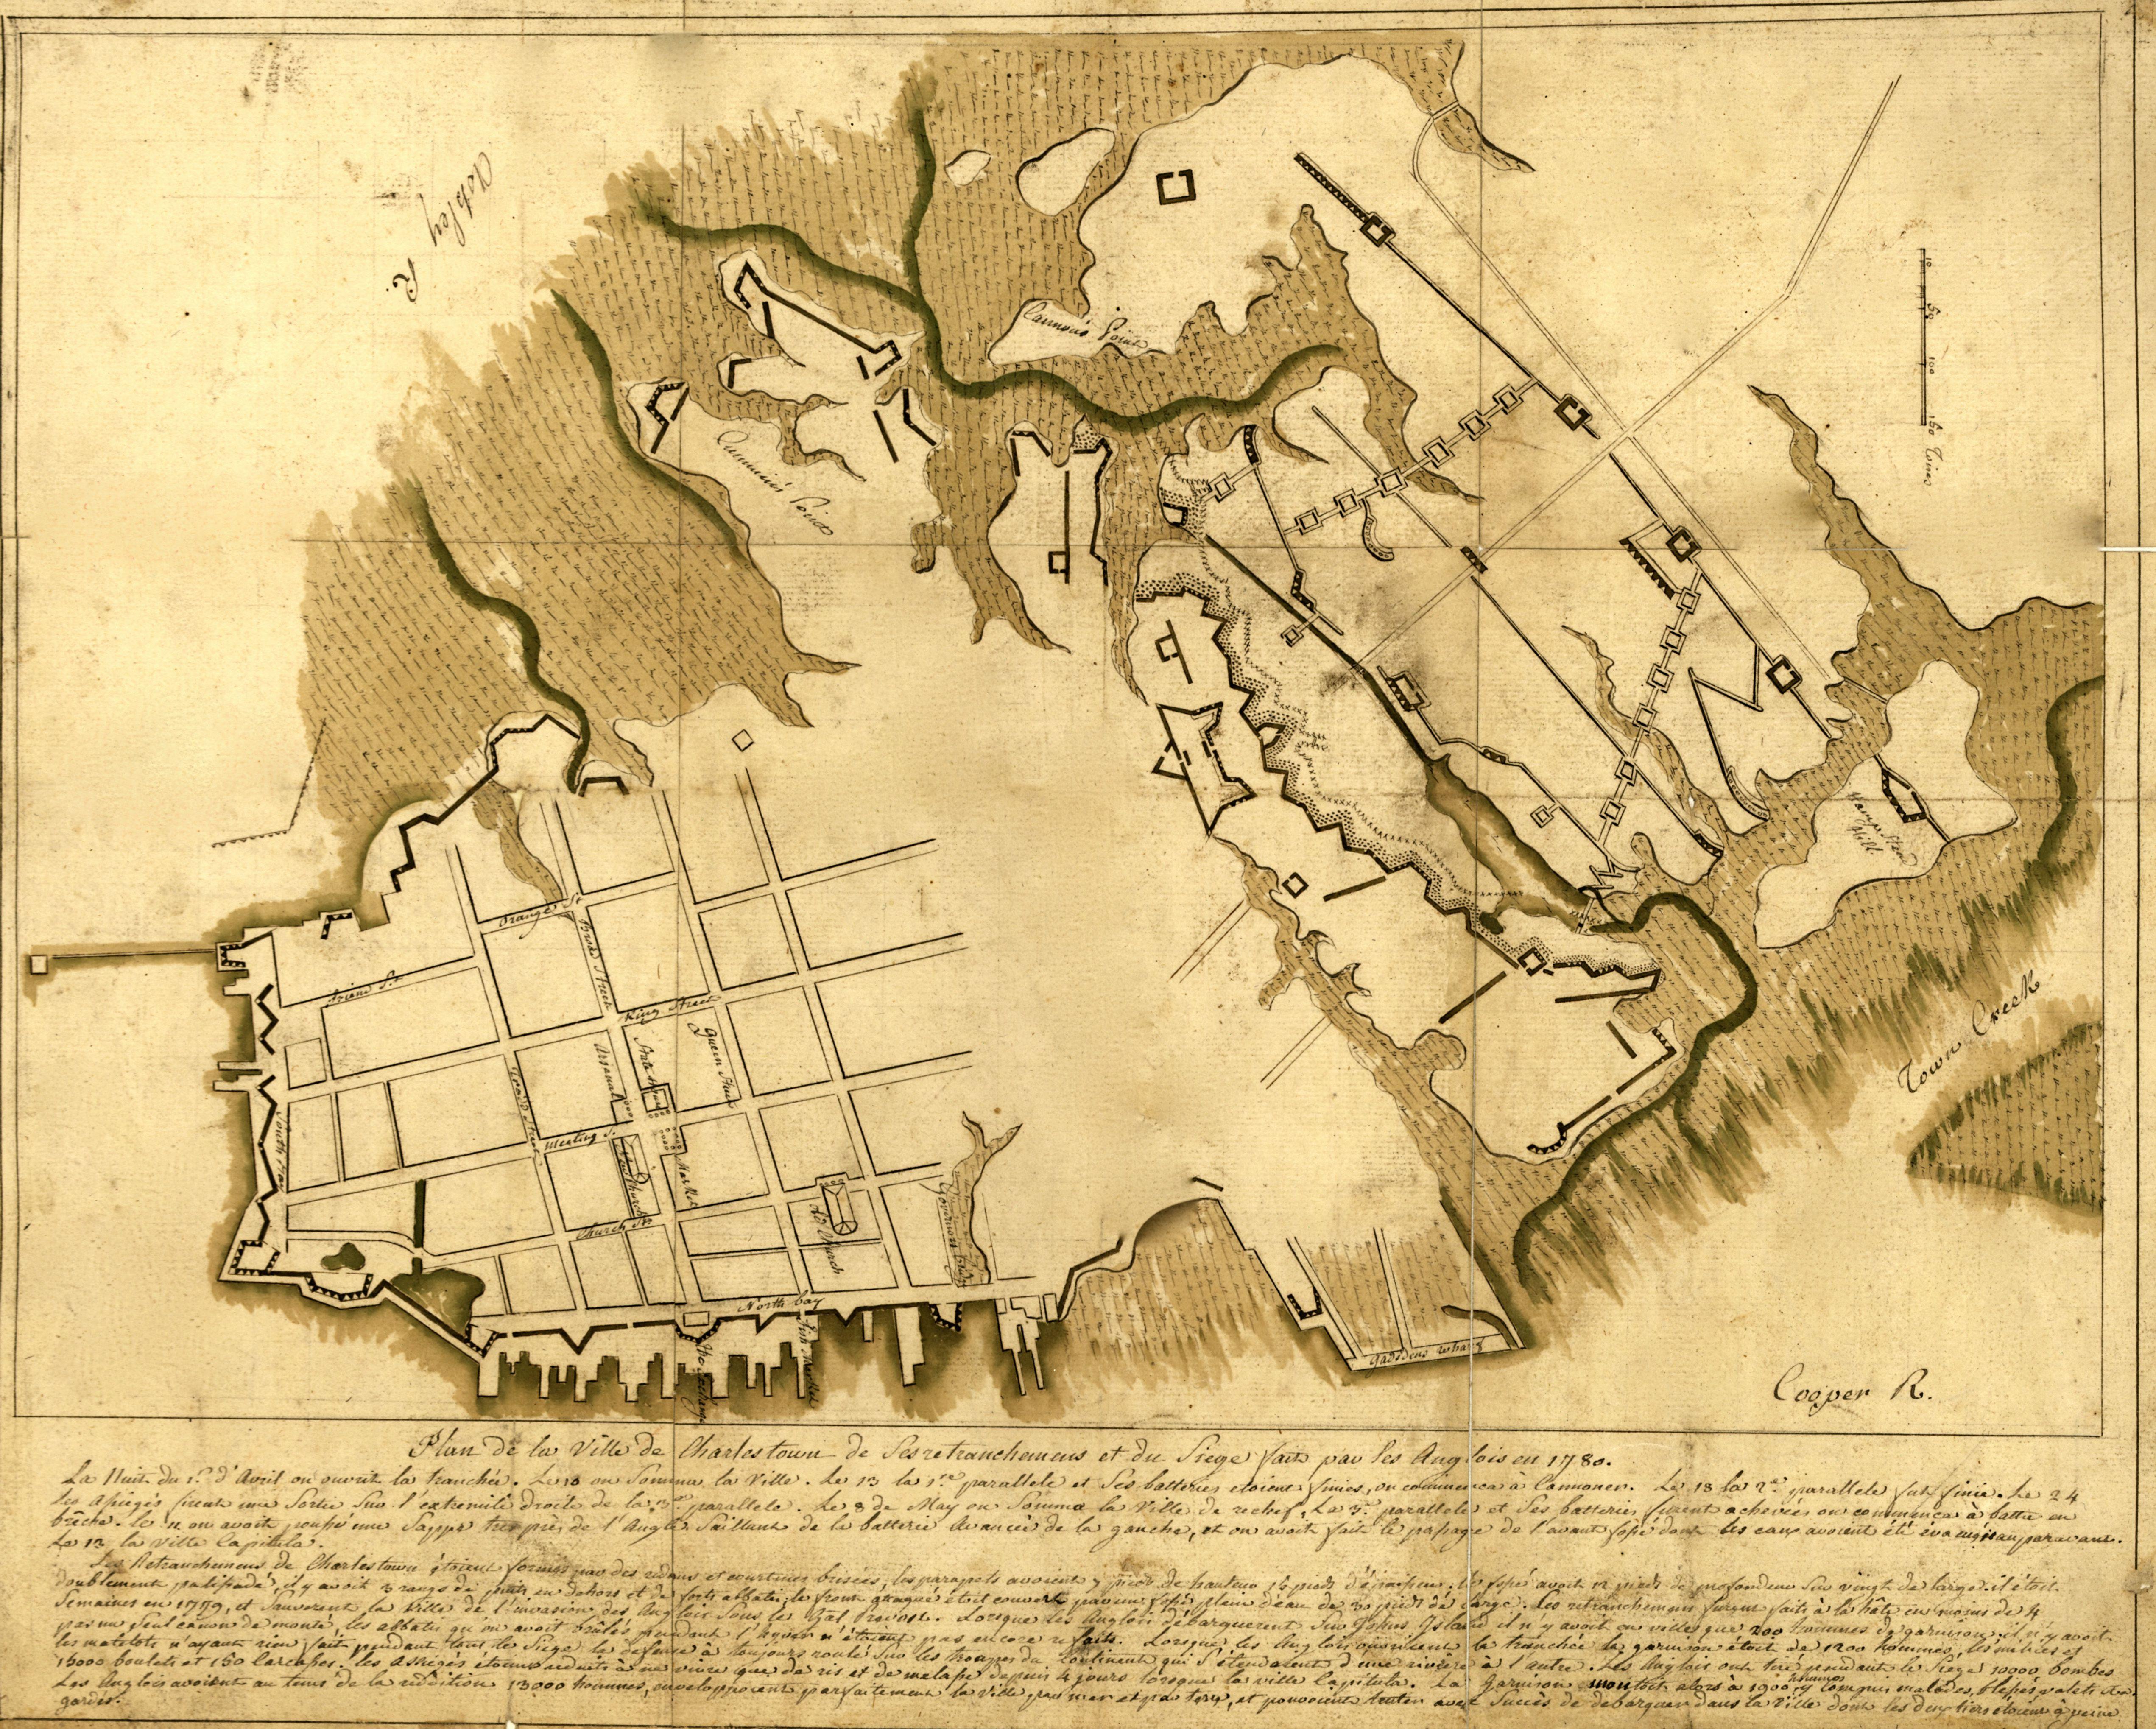 Map of the British defenses at Charleston.